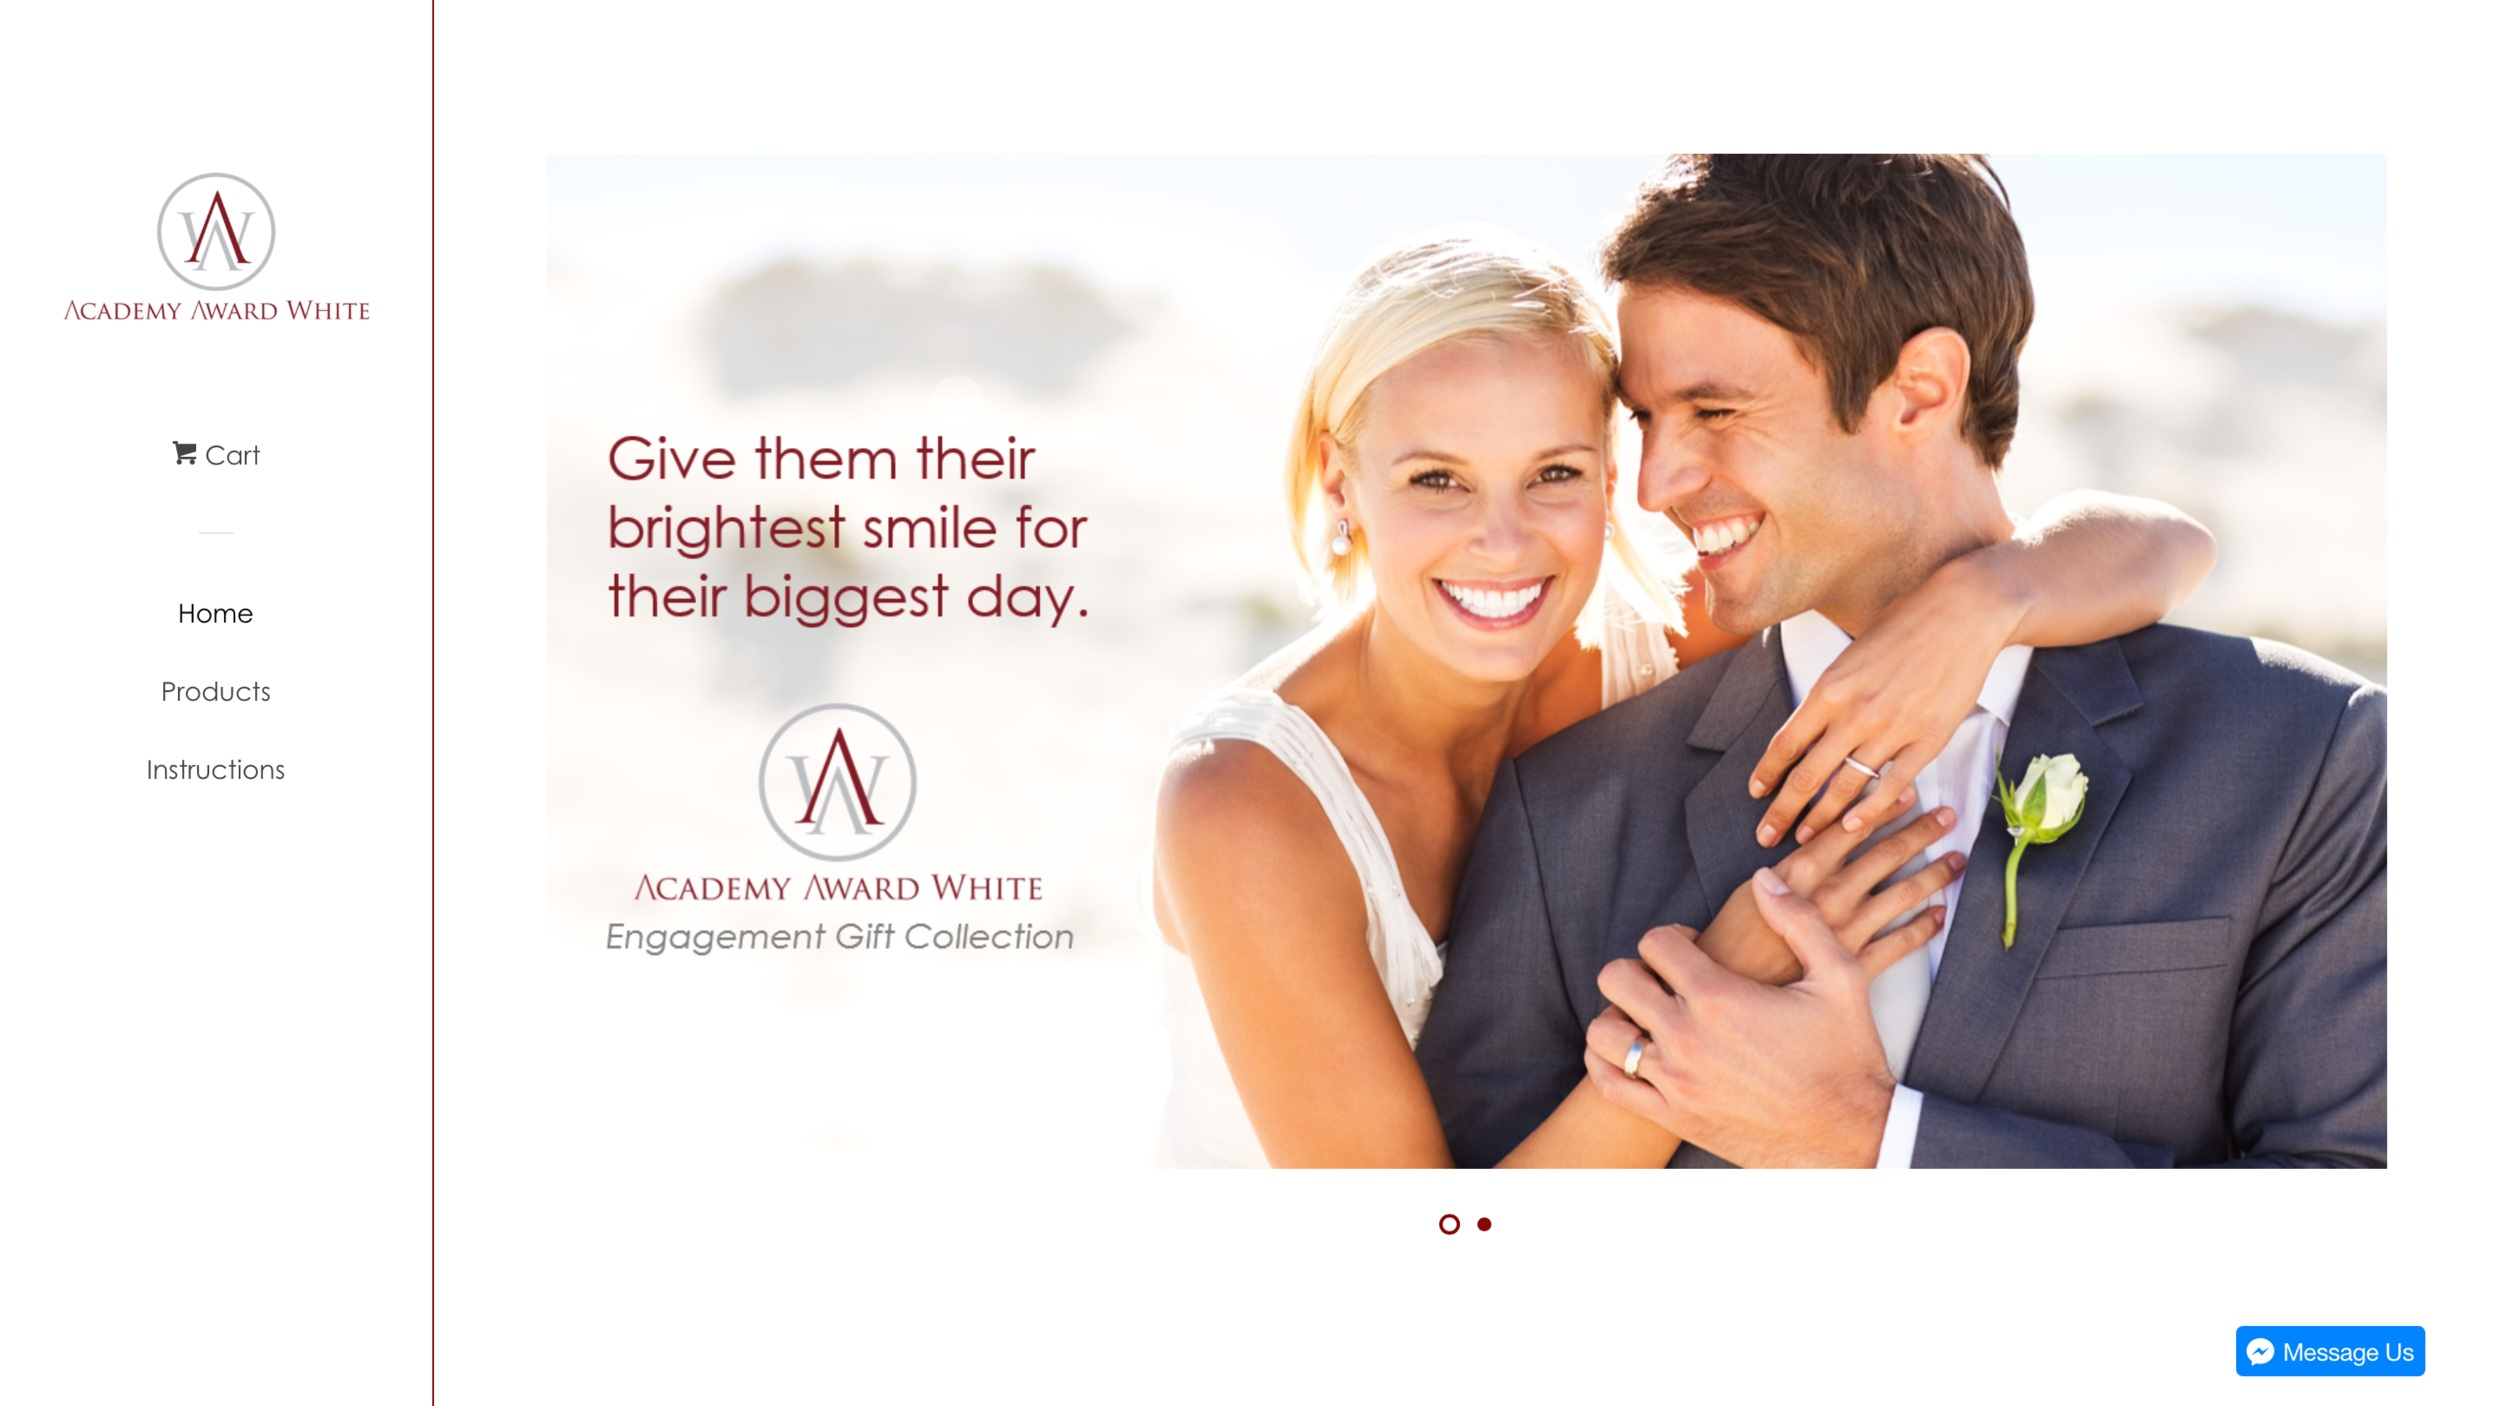 https://www.weddingwhitesmiles.com  Best wedding market consulting and wedding market stats. Consumer product and dental industries. Wedding White Smiles